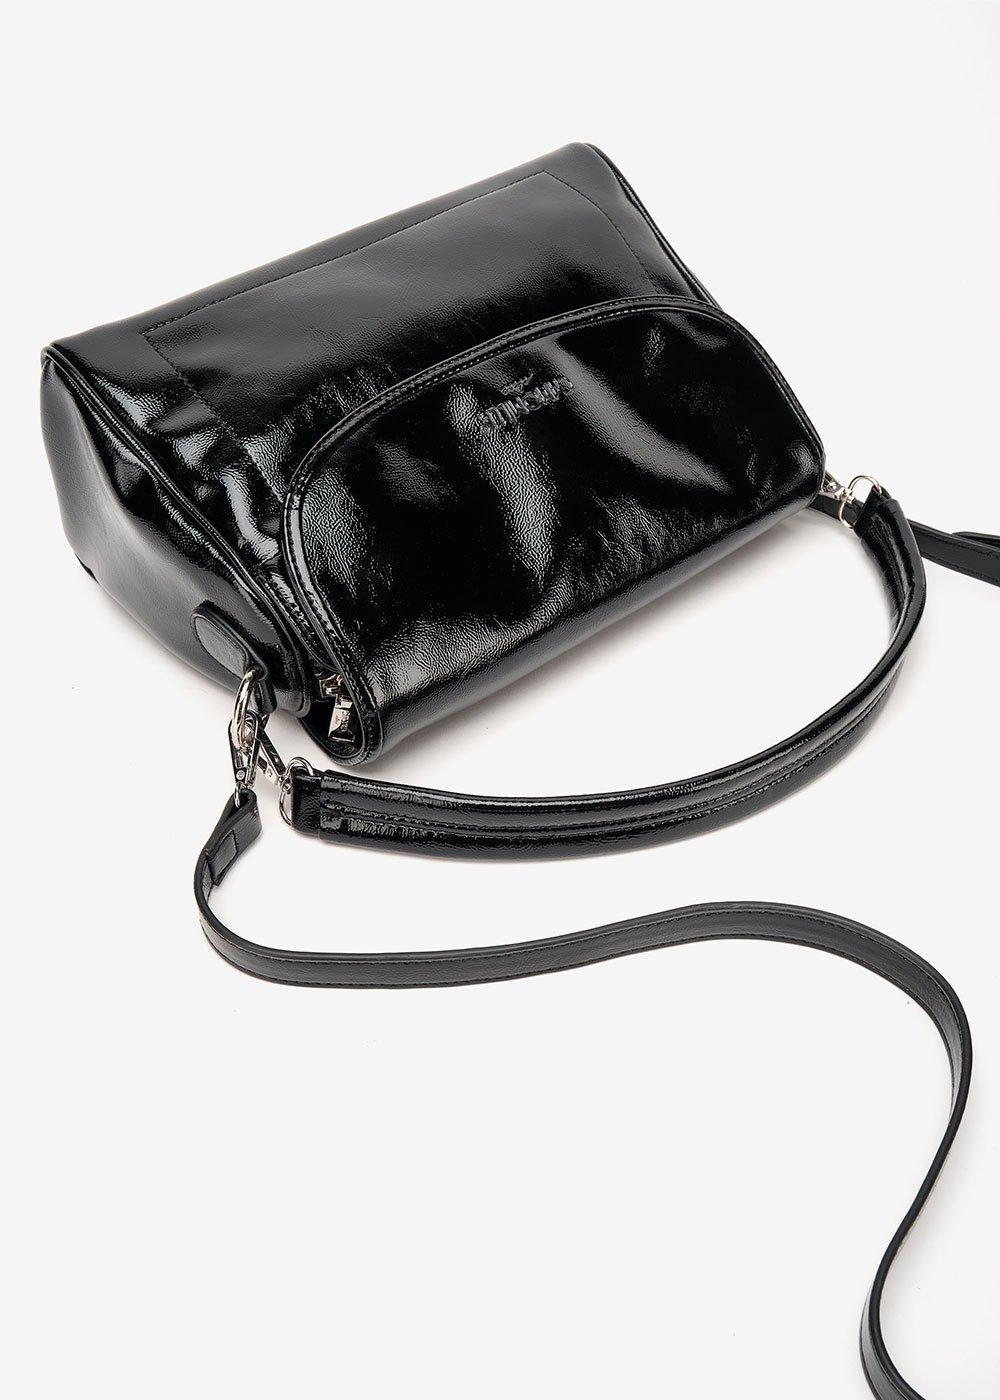 Brays patent leather bag - Black - Woman